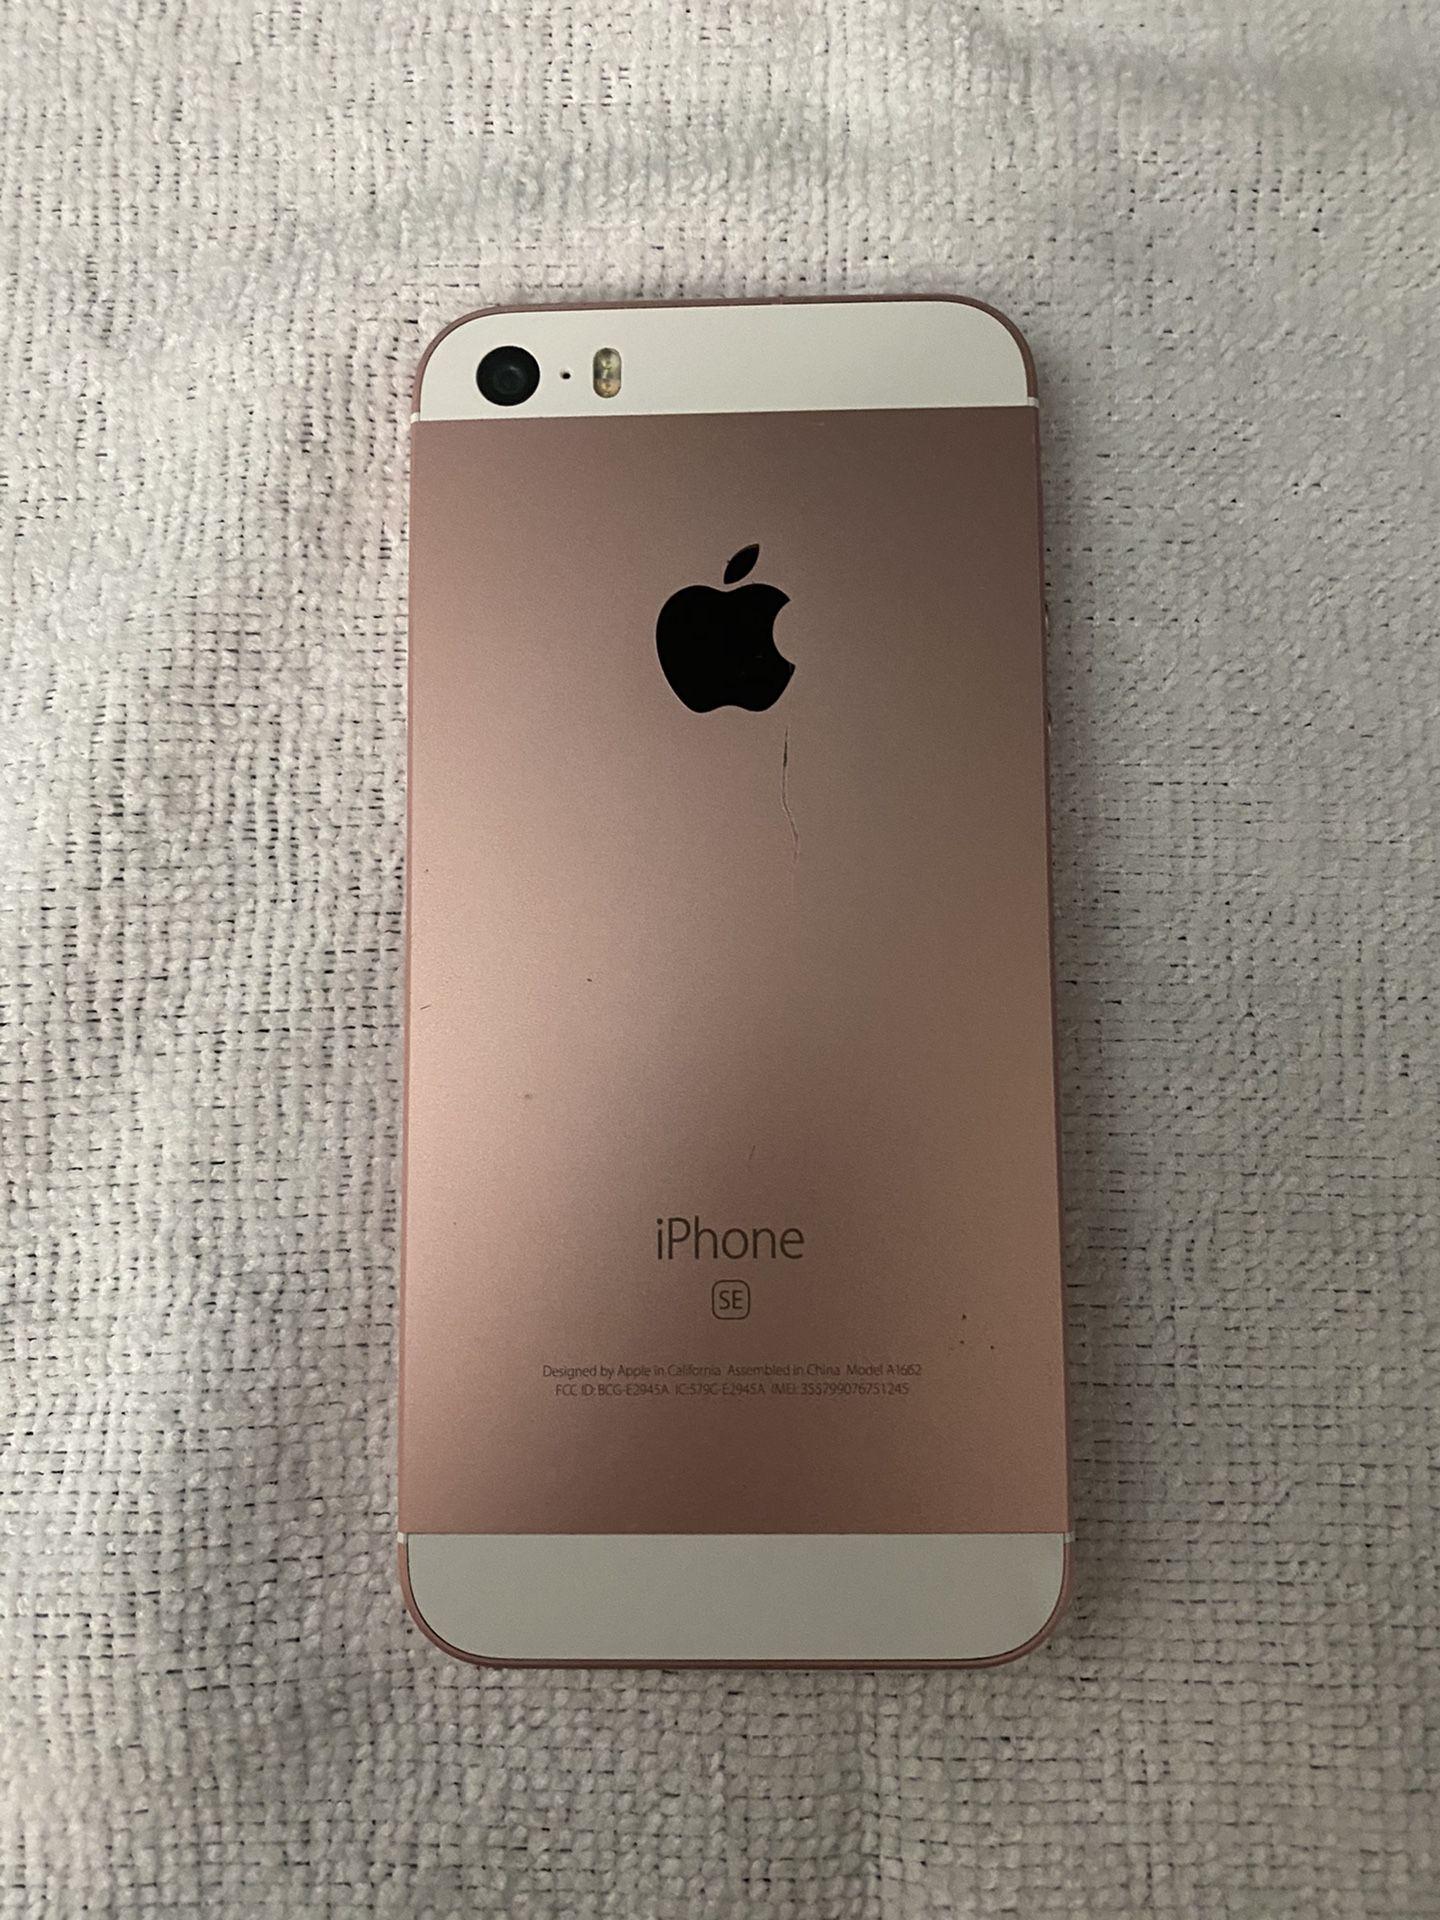 iPhone SE Old model